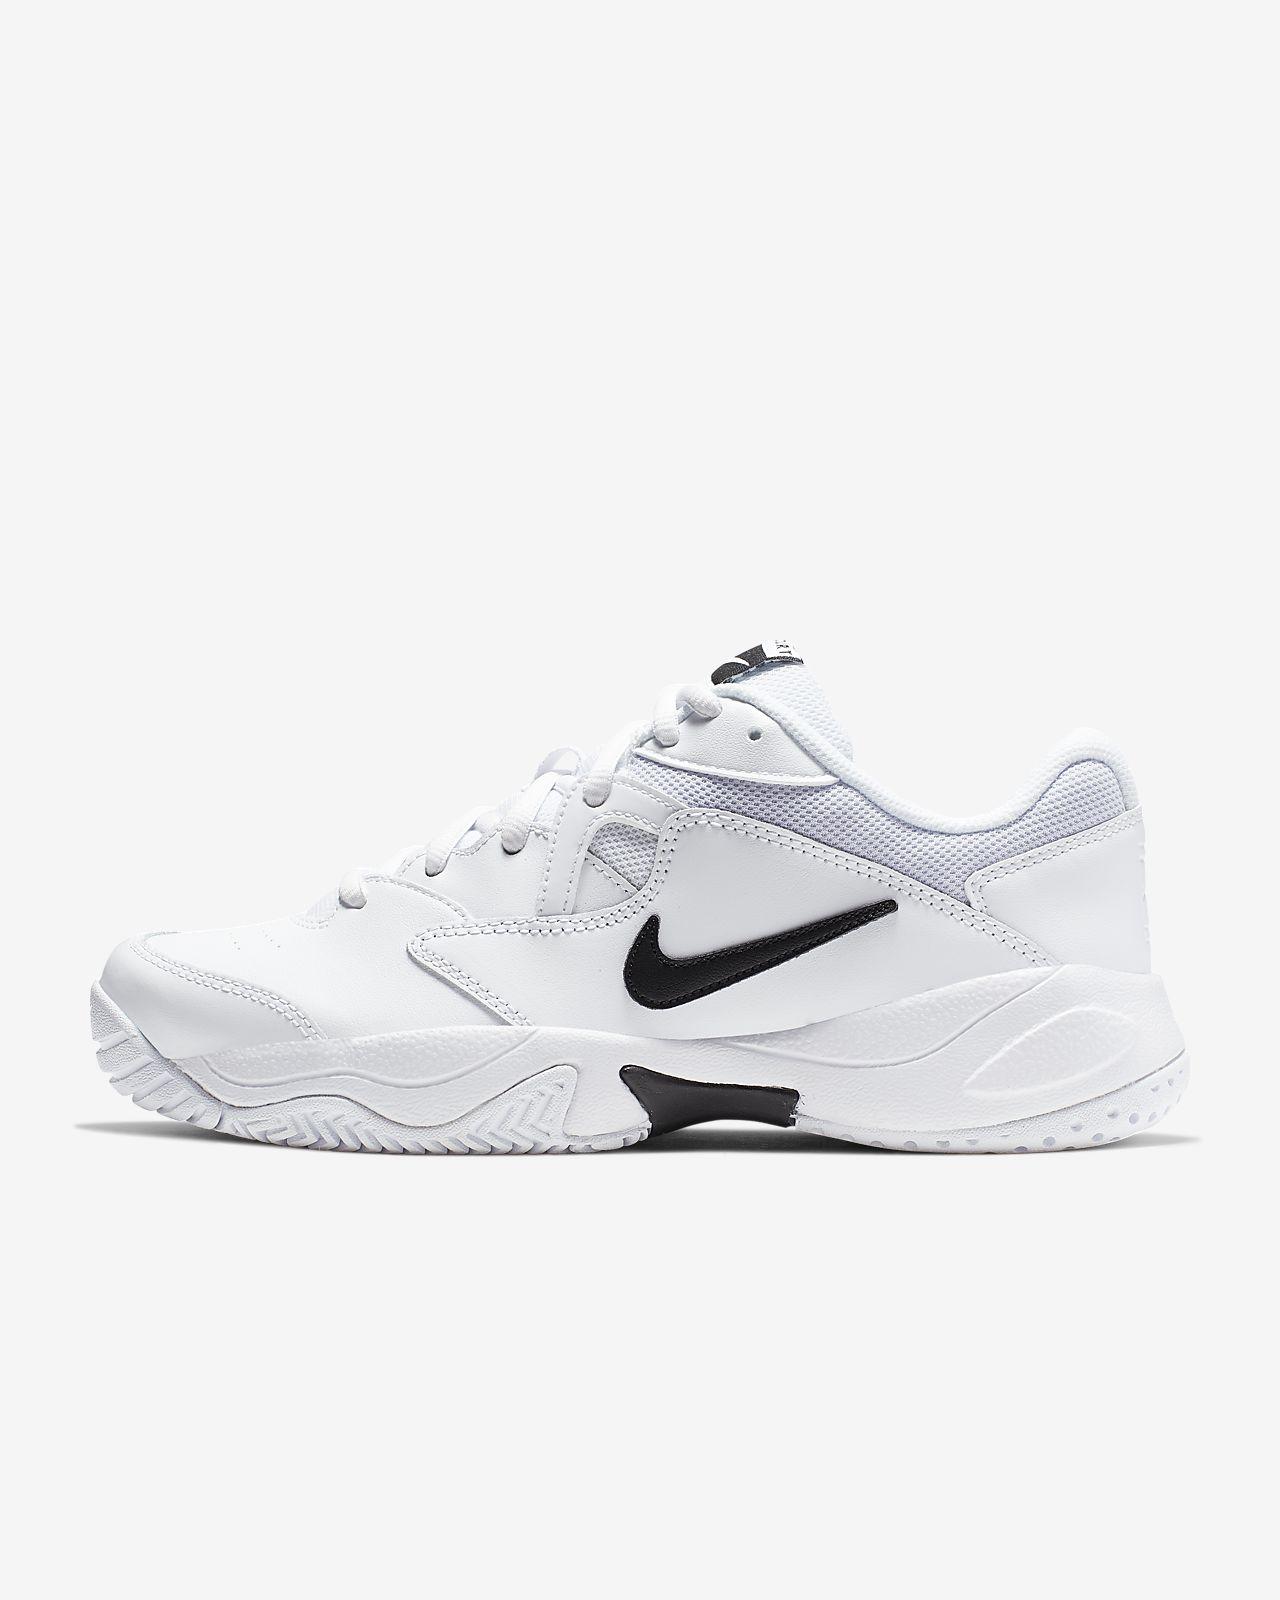 newest 79ac2 76b09 ... Calzado de tenis en cancha dura para mujer NikeCourt Lite 2